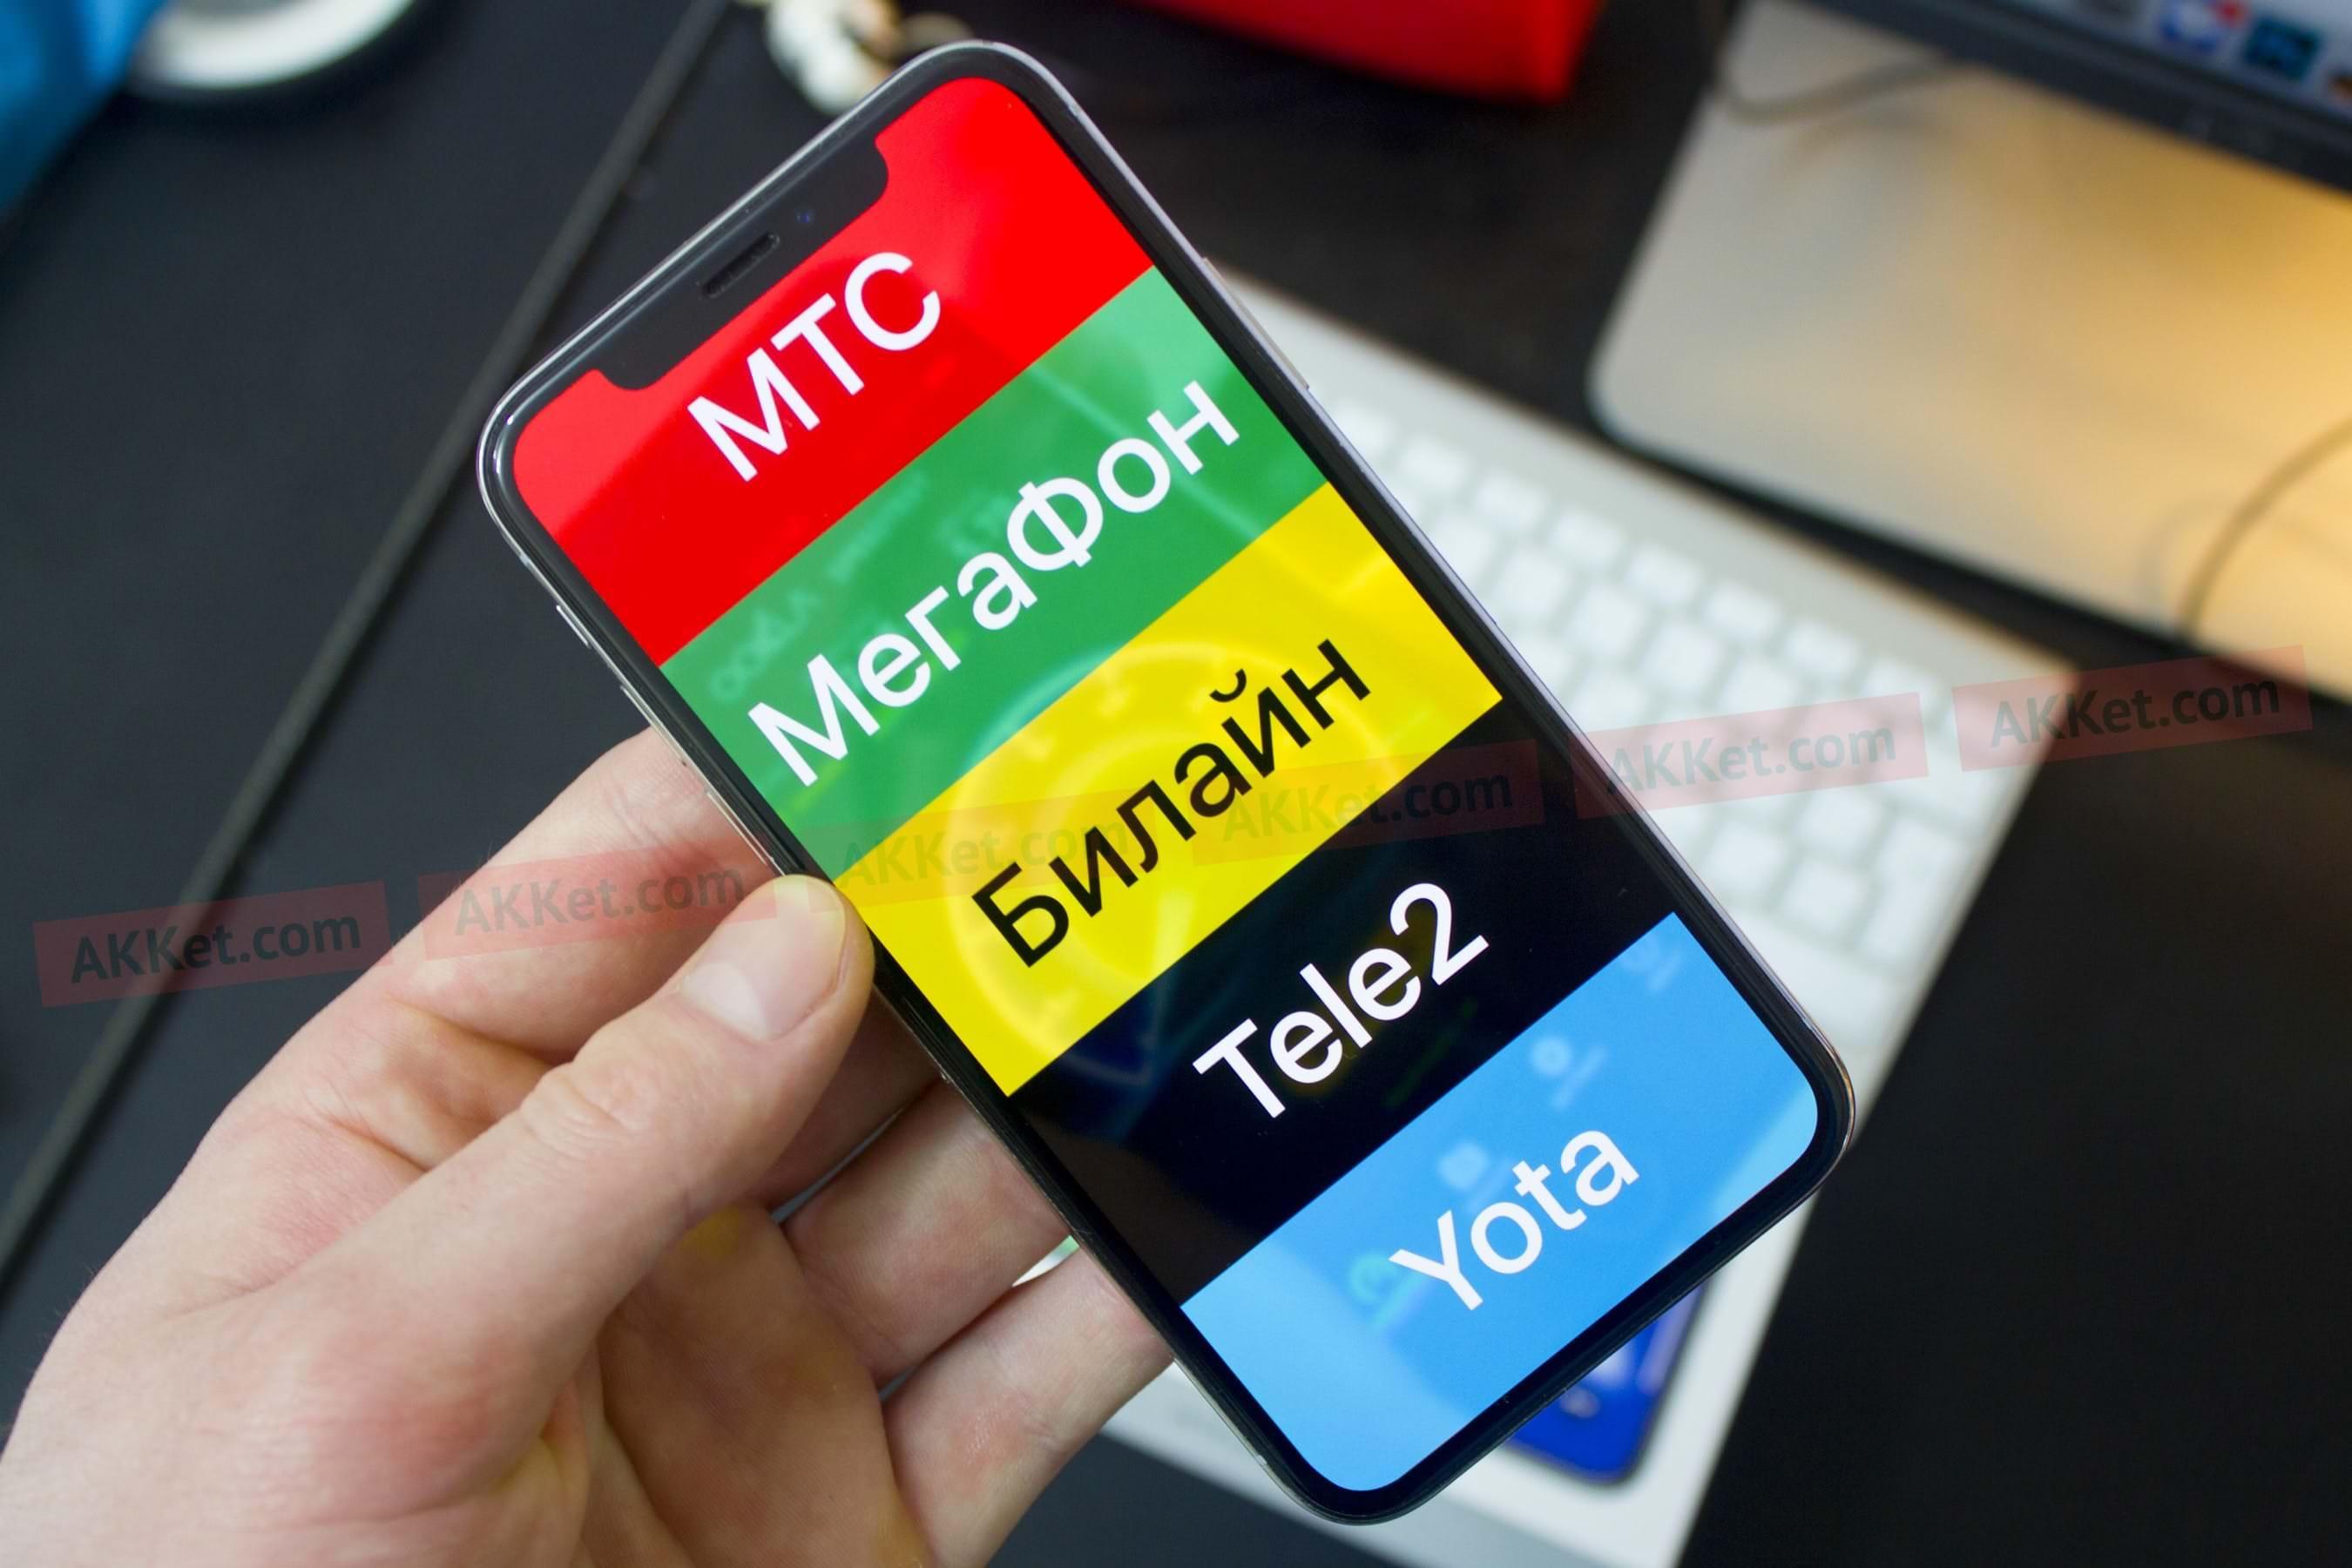 https://akket.com/wp-content/uploads/2018/07/Kosmicheskii-internet-MTS-Bilai-n-i-MegaFon-4.jpg